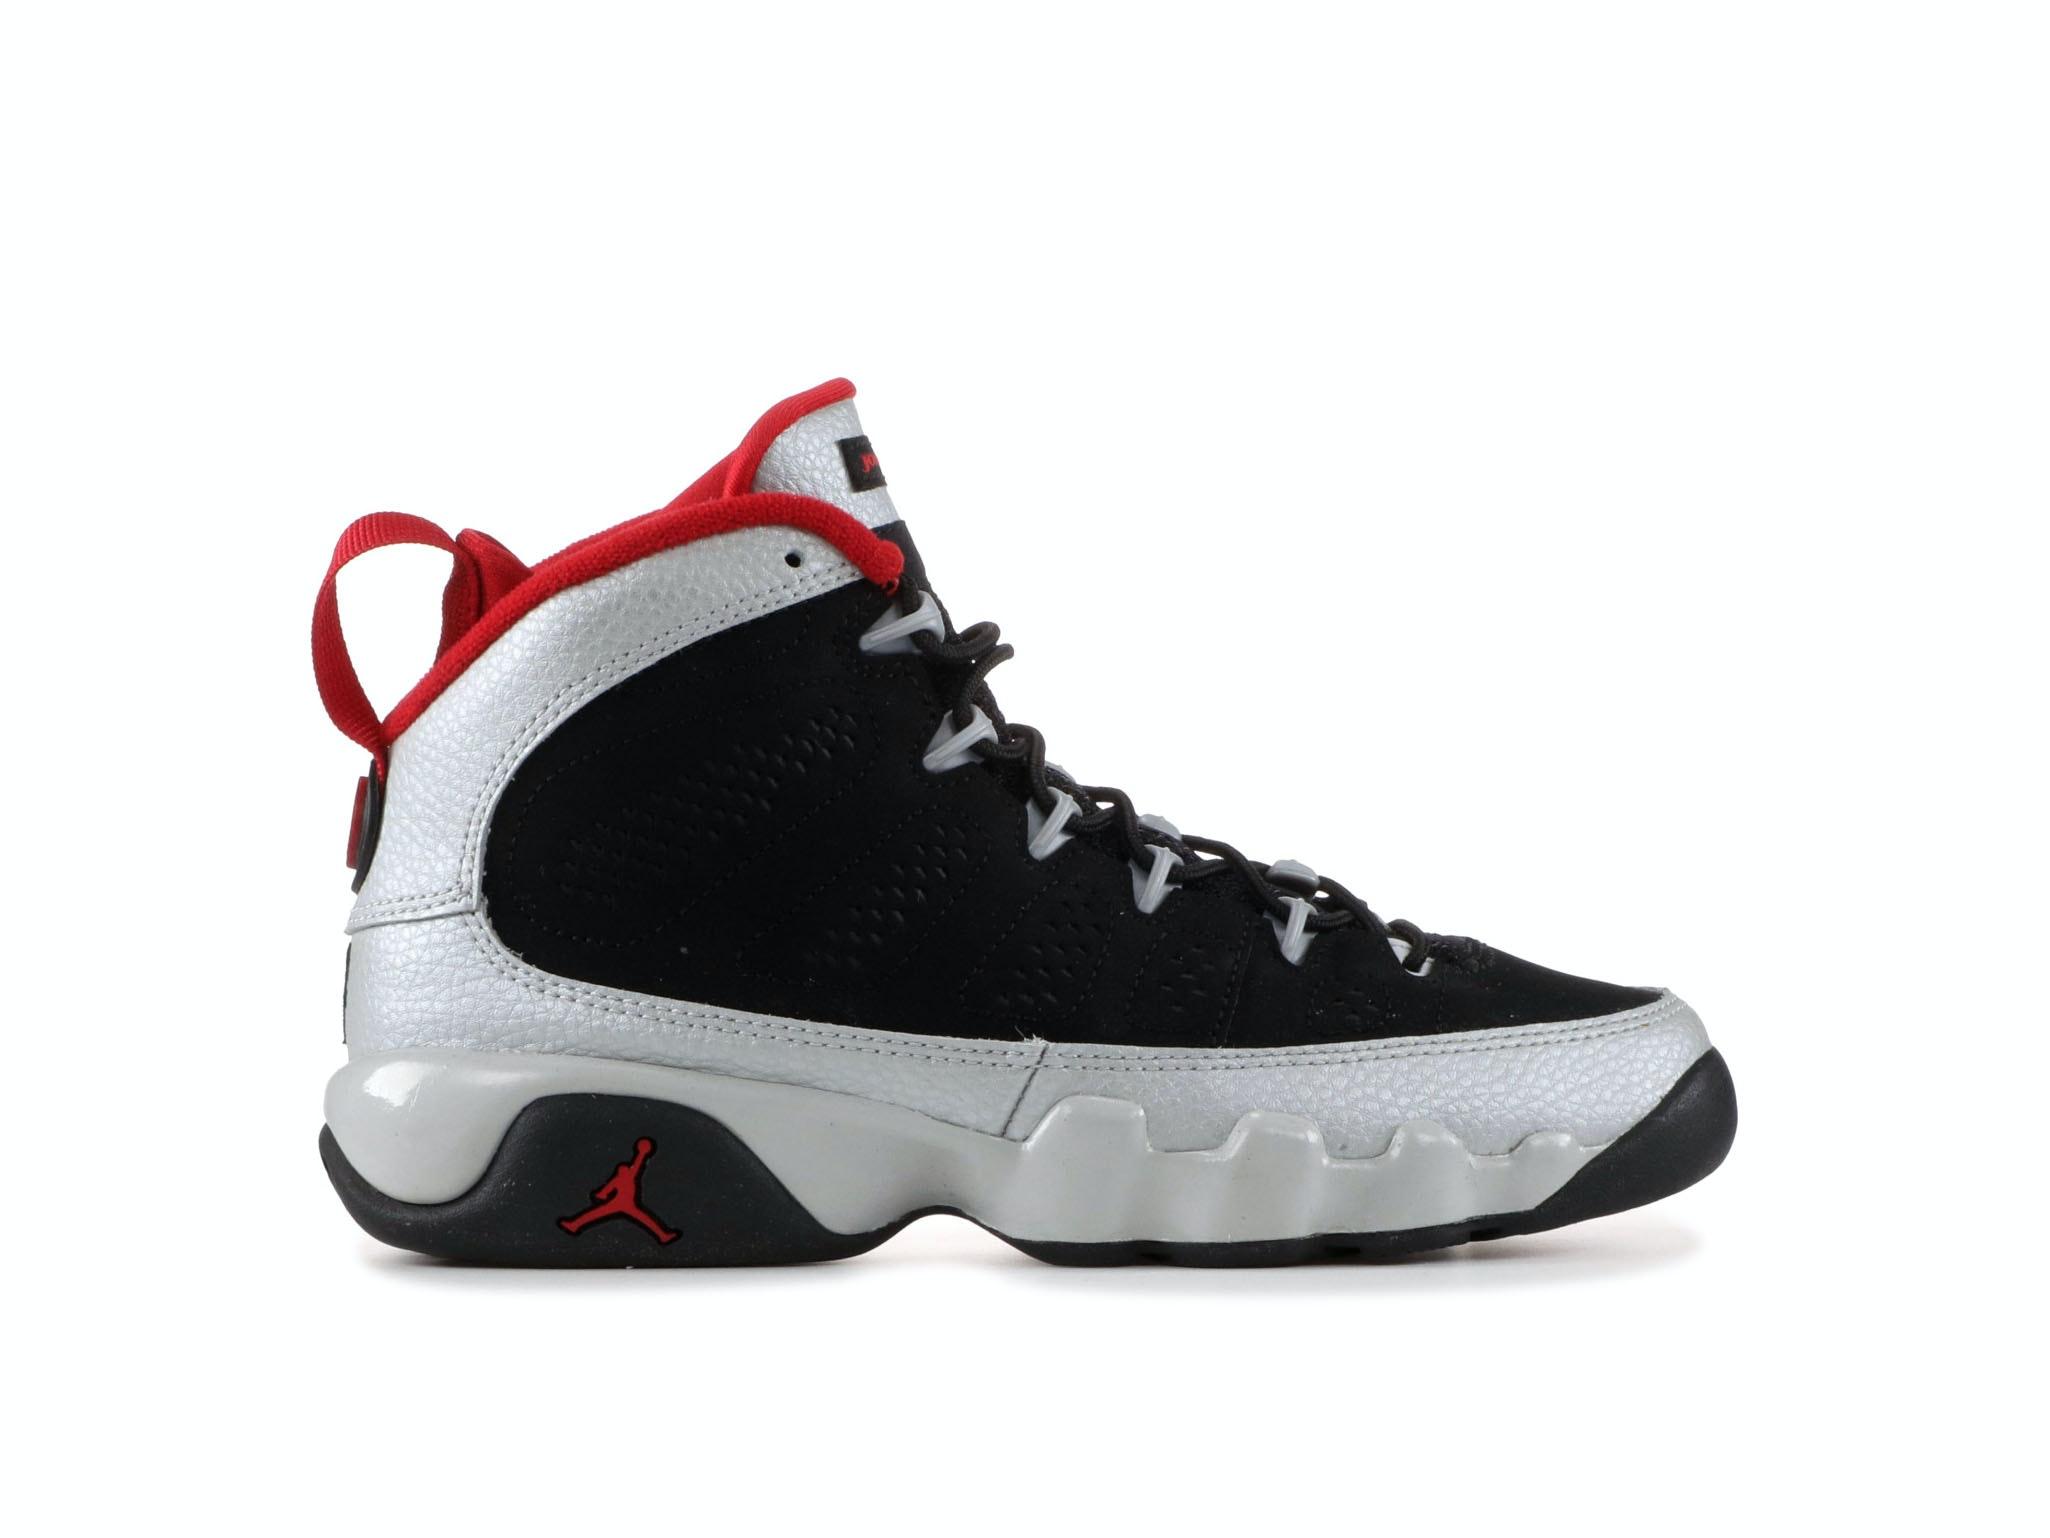 272c8f55c1f5ce Shop Air Jordan 9 Retro GS Johnny Kilroy Online